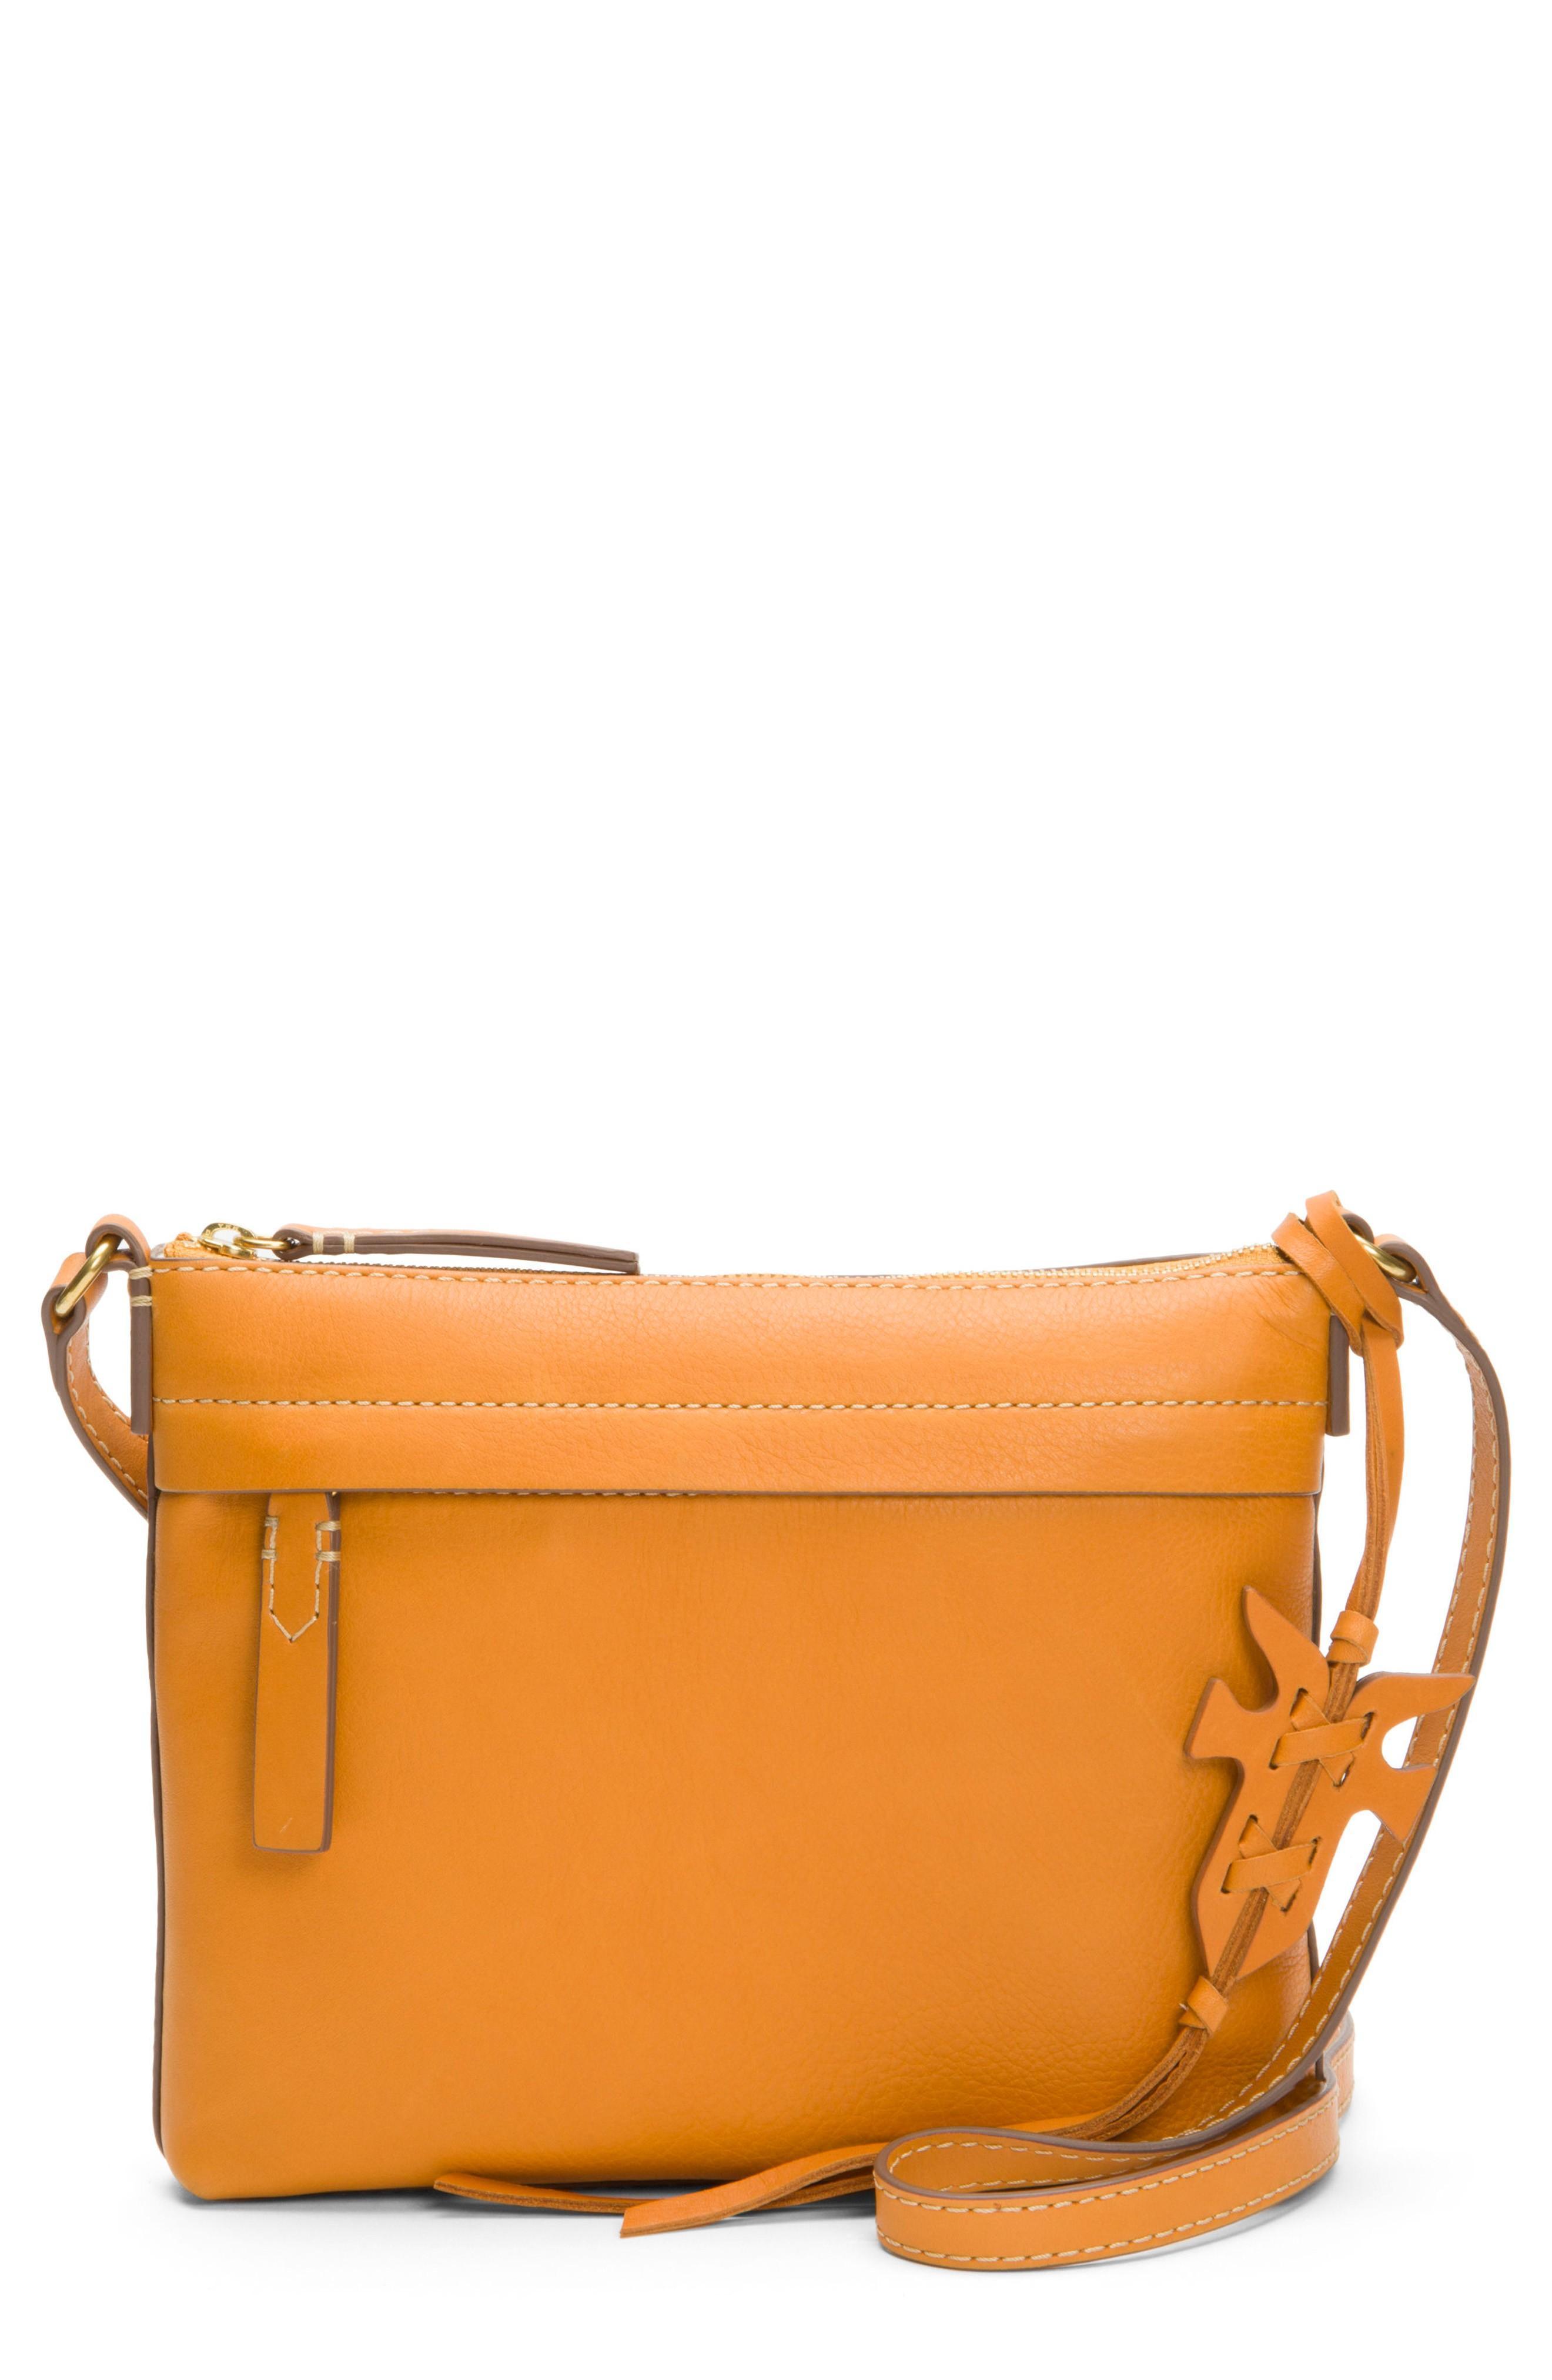 Frye Carson Leather Crossbody Bag - Orange In Sunrise